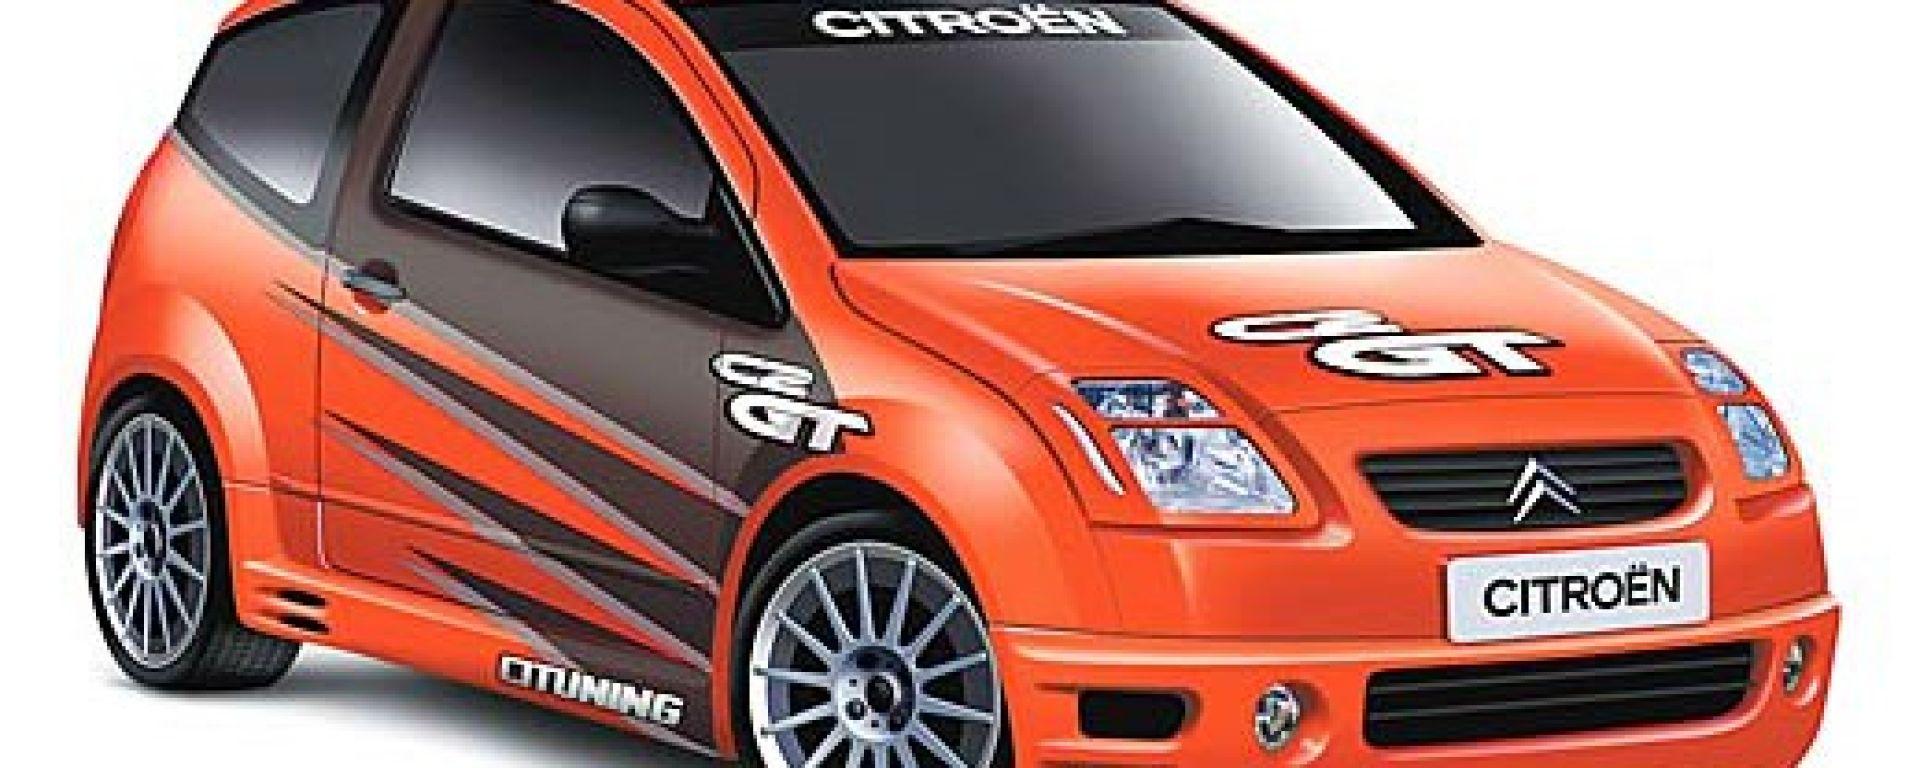 Anteprima: Citroën C2 GT